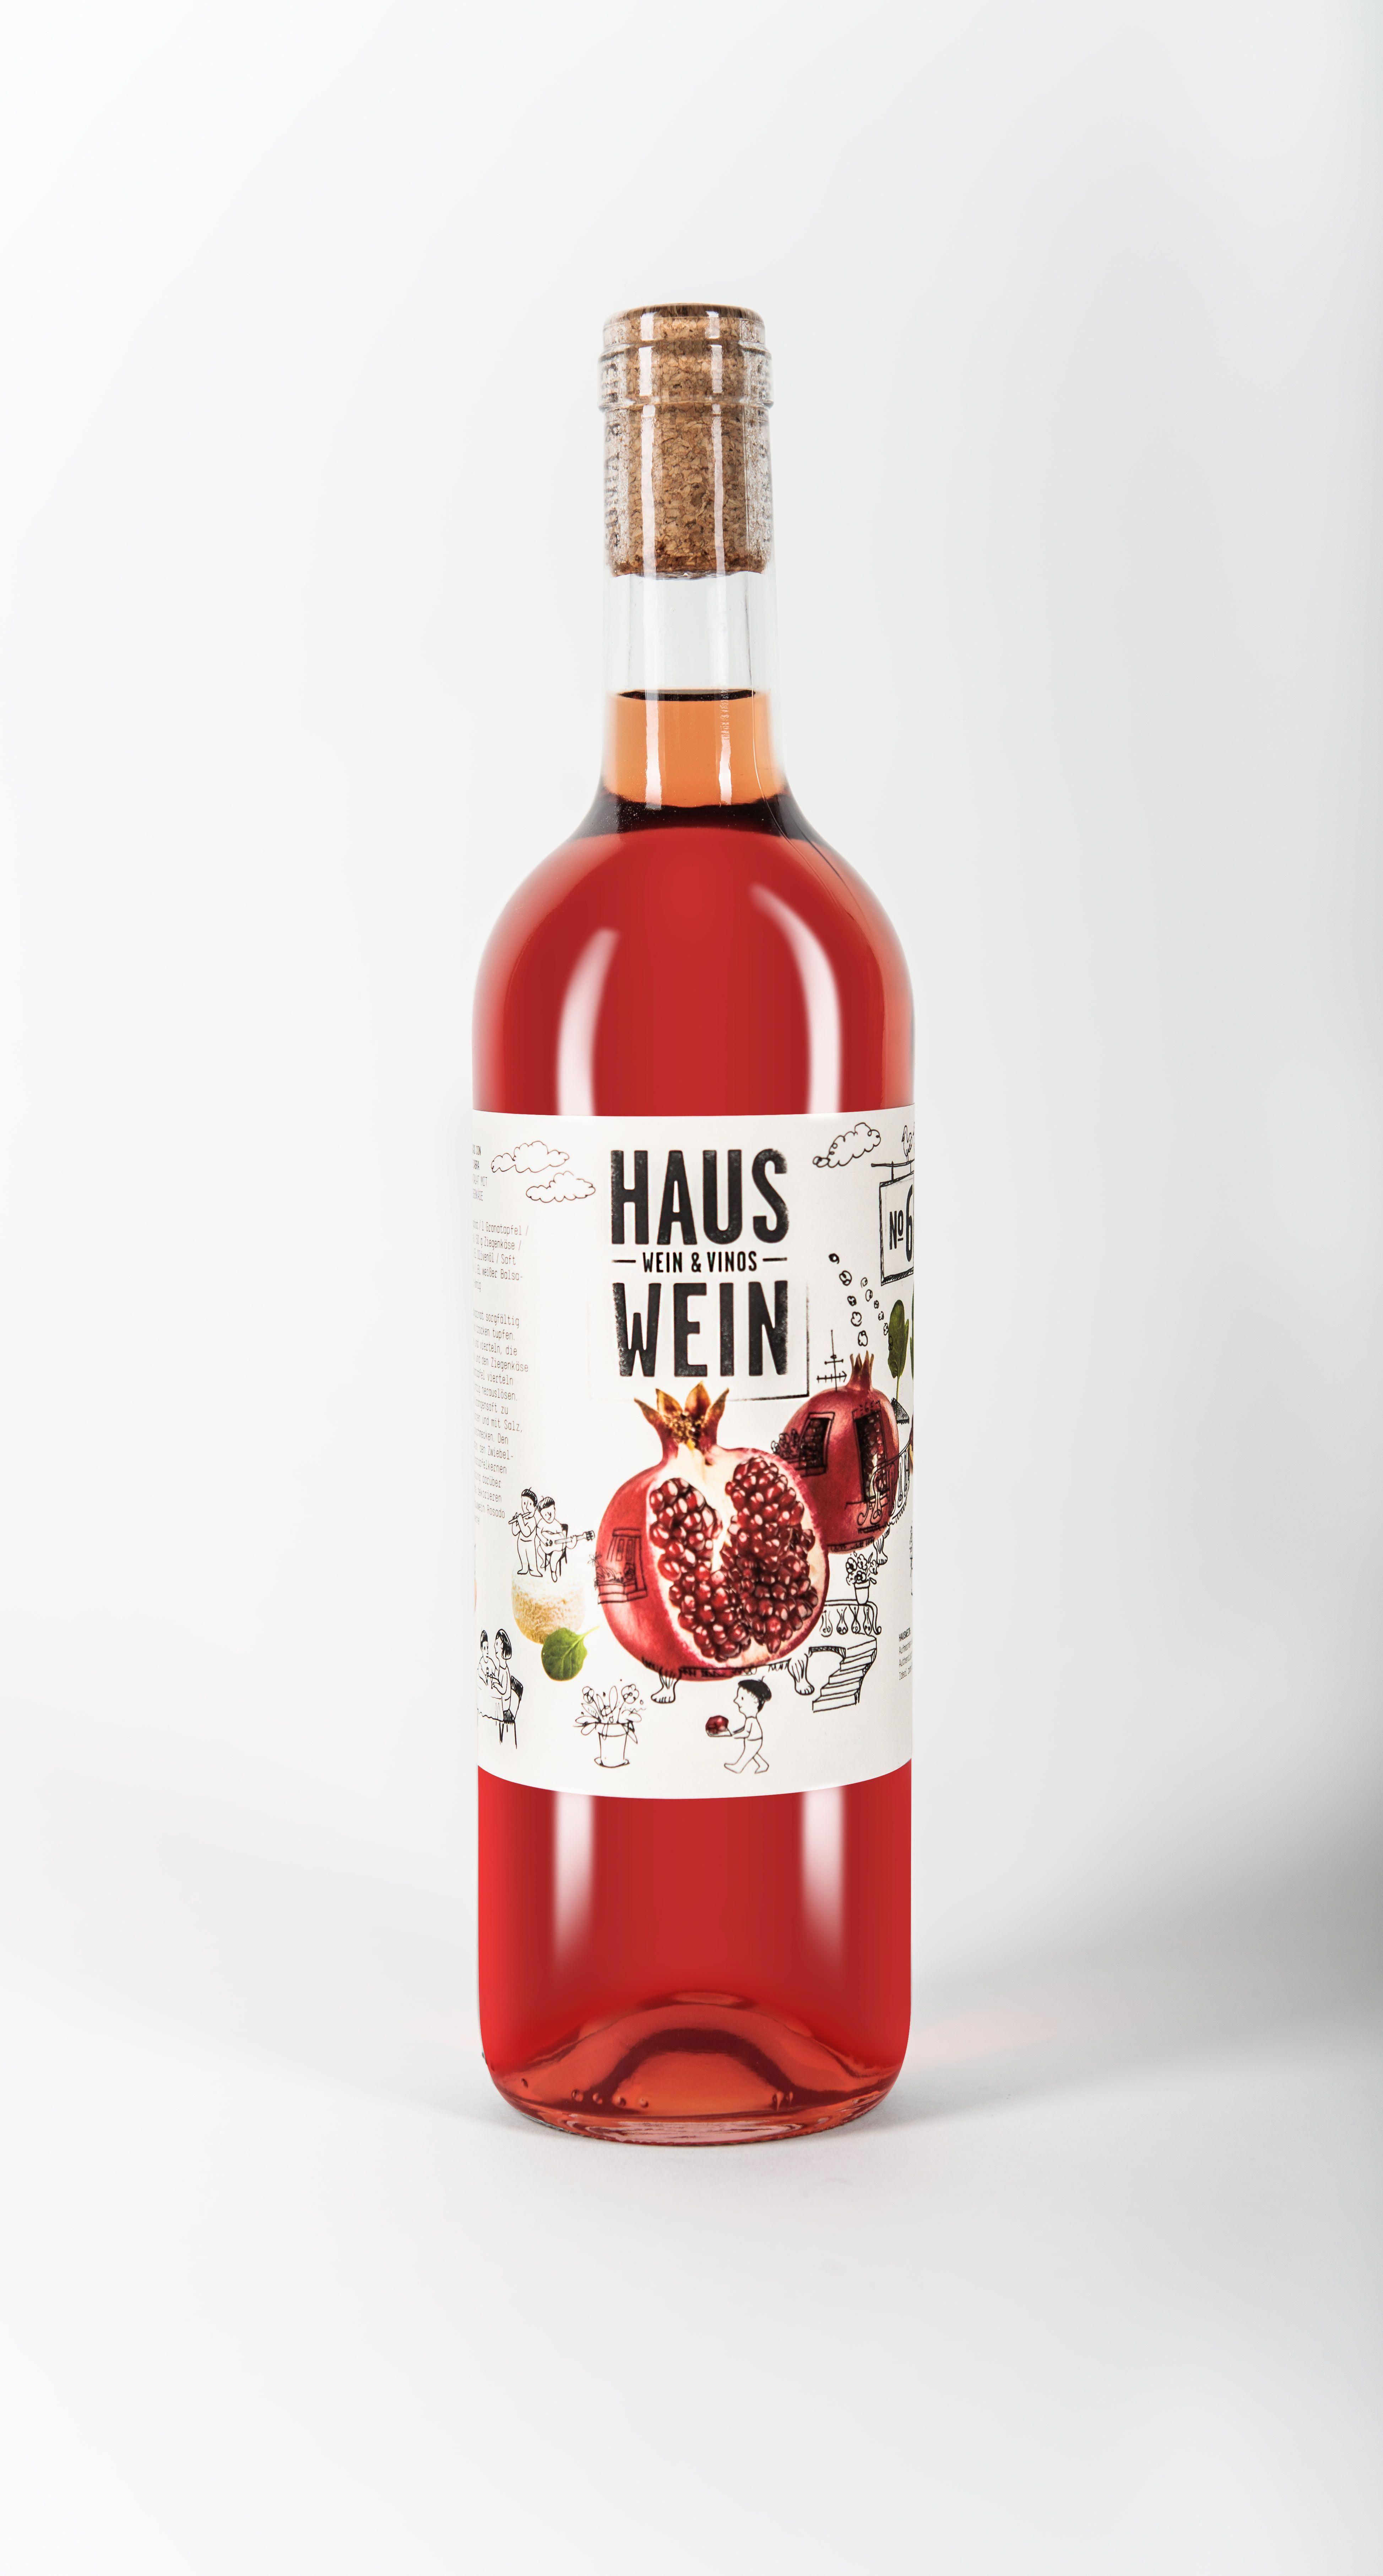 Shipping Wine To Texas Wineenthusiastgifts Info 2668634423 Caseofwine Wine Drinks Wine Brands Wine Gifts